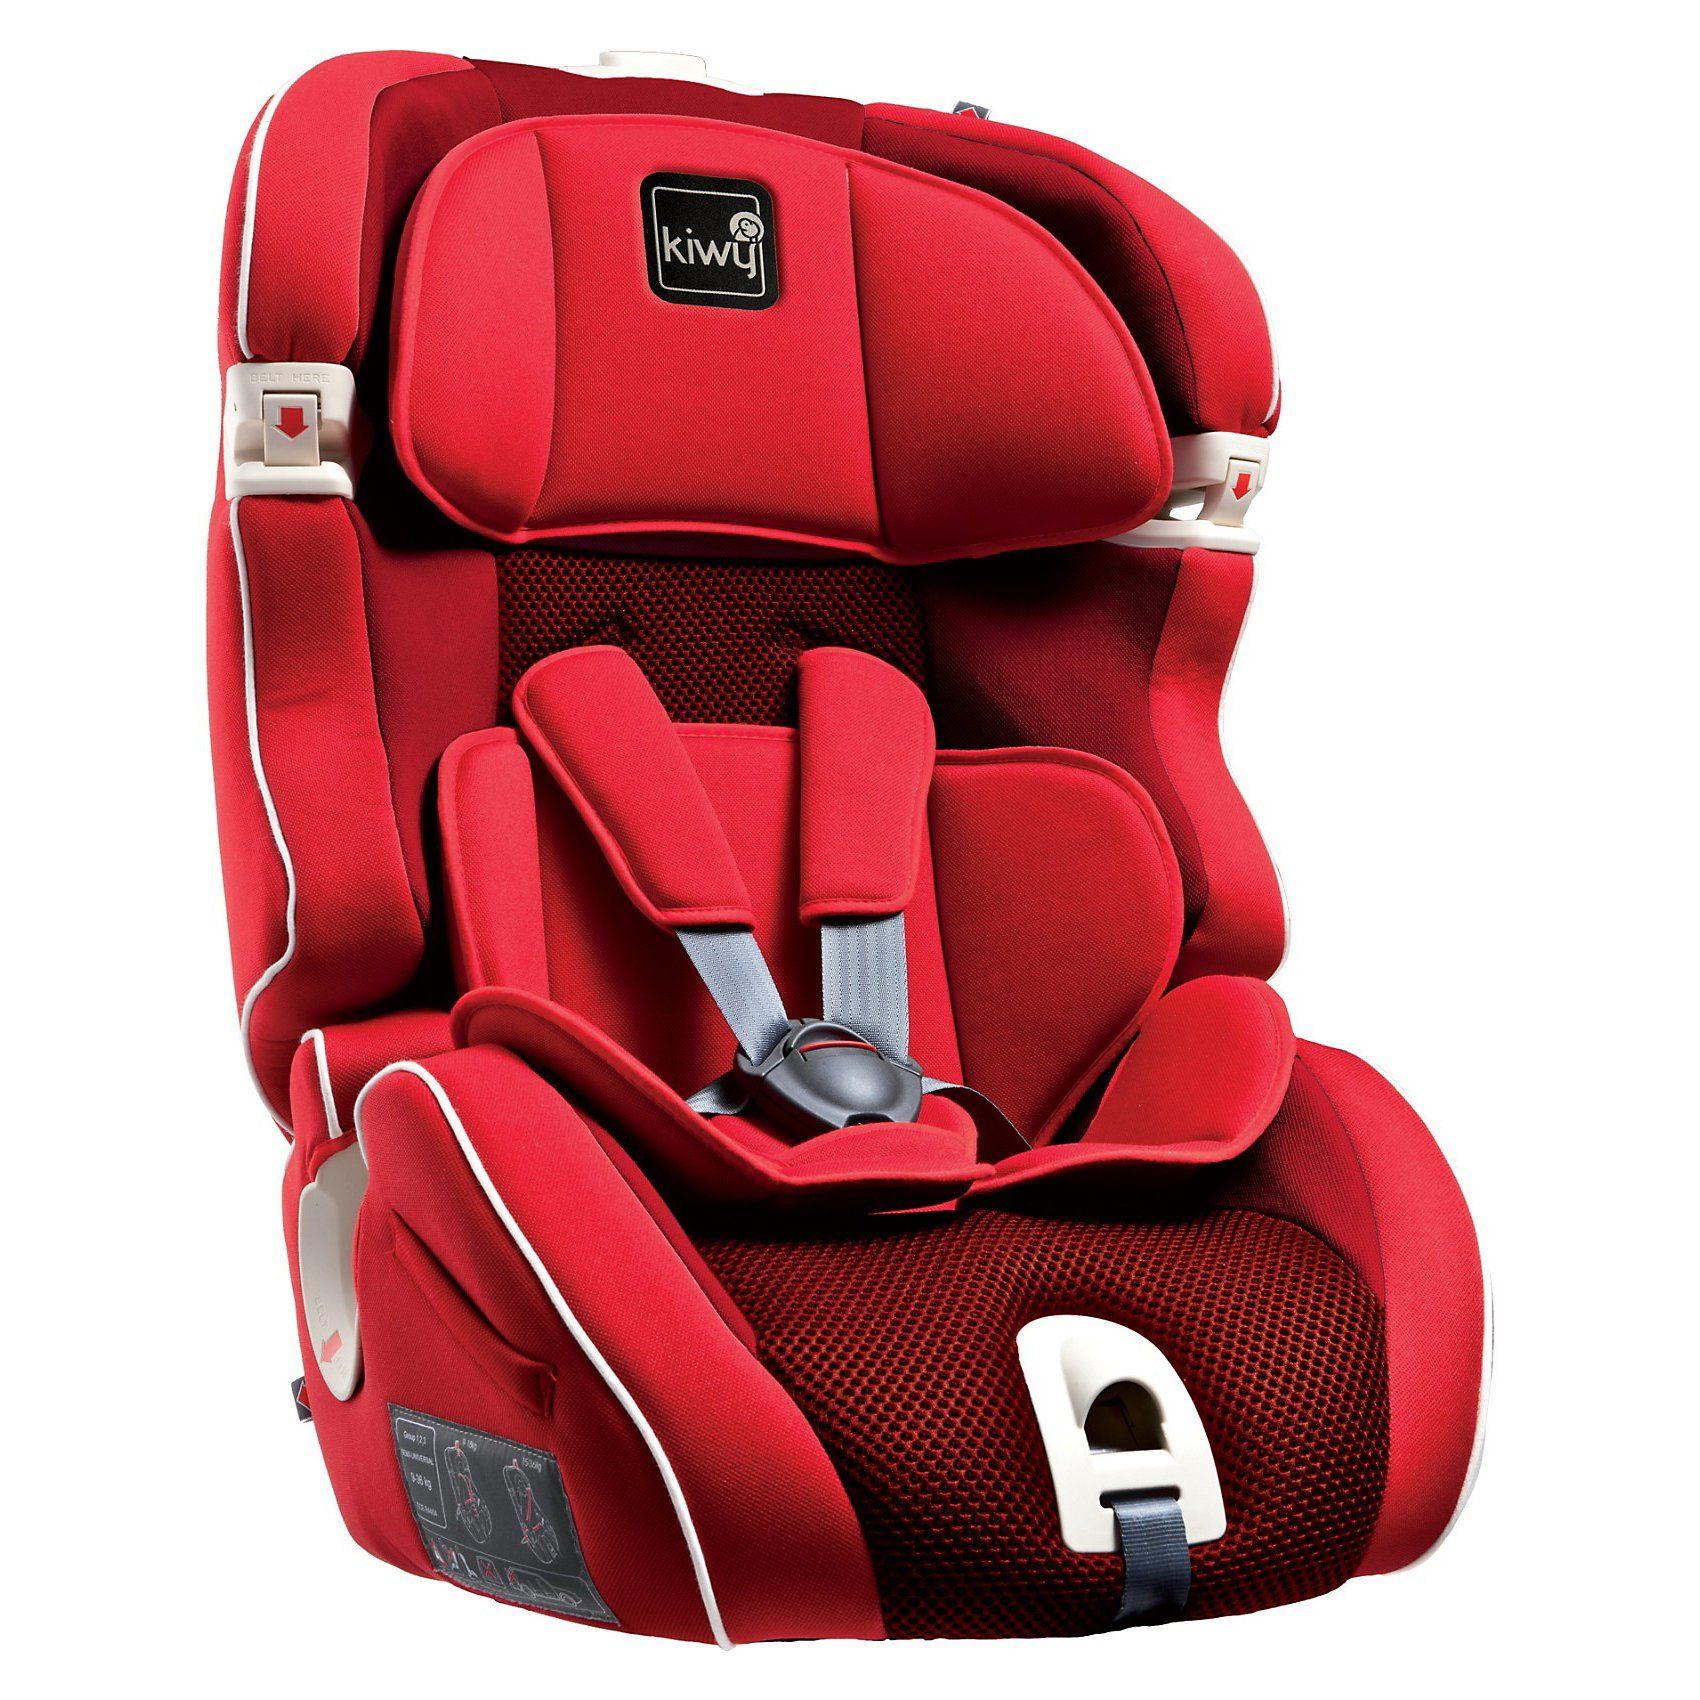 Kiwy Auto-Kindersitz SL123, Cherry, 2016